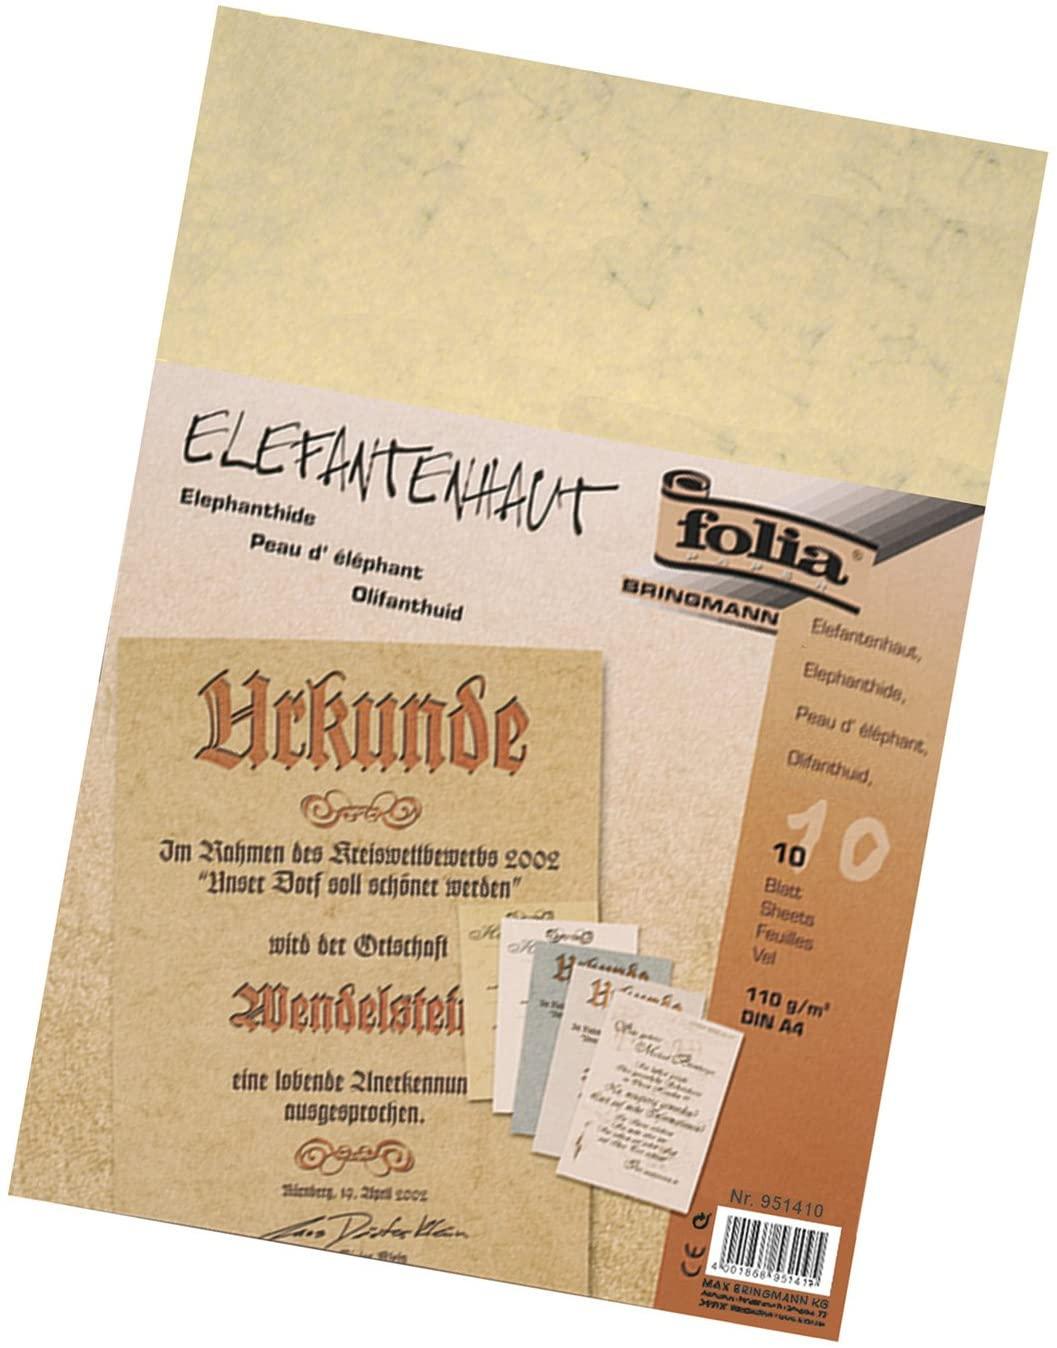 Bringmann Folia 951410–Elephant Skin, 110g/m², DIN A4, 10Sheets Chamois